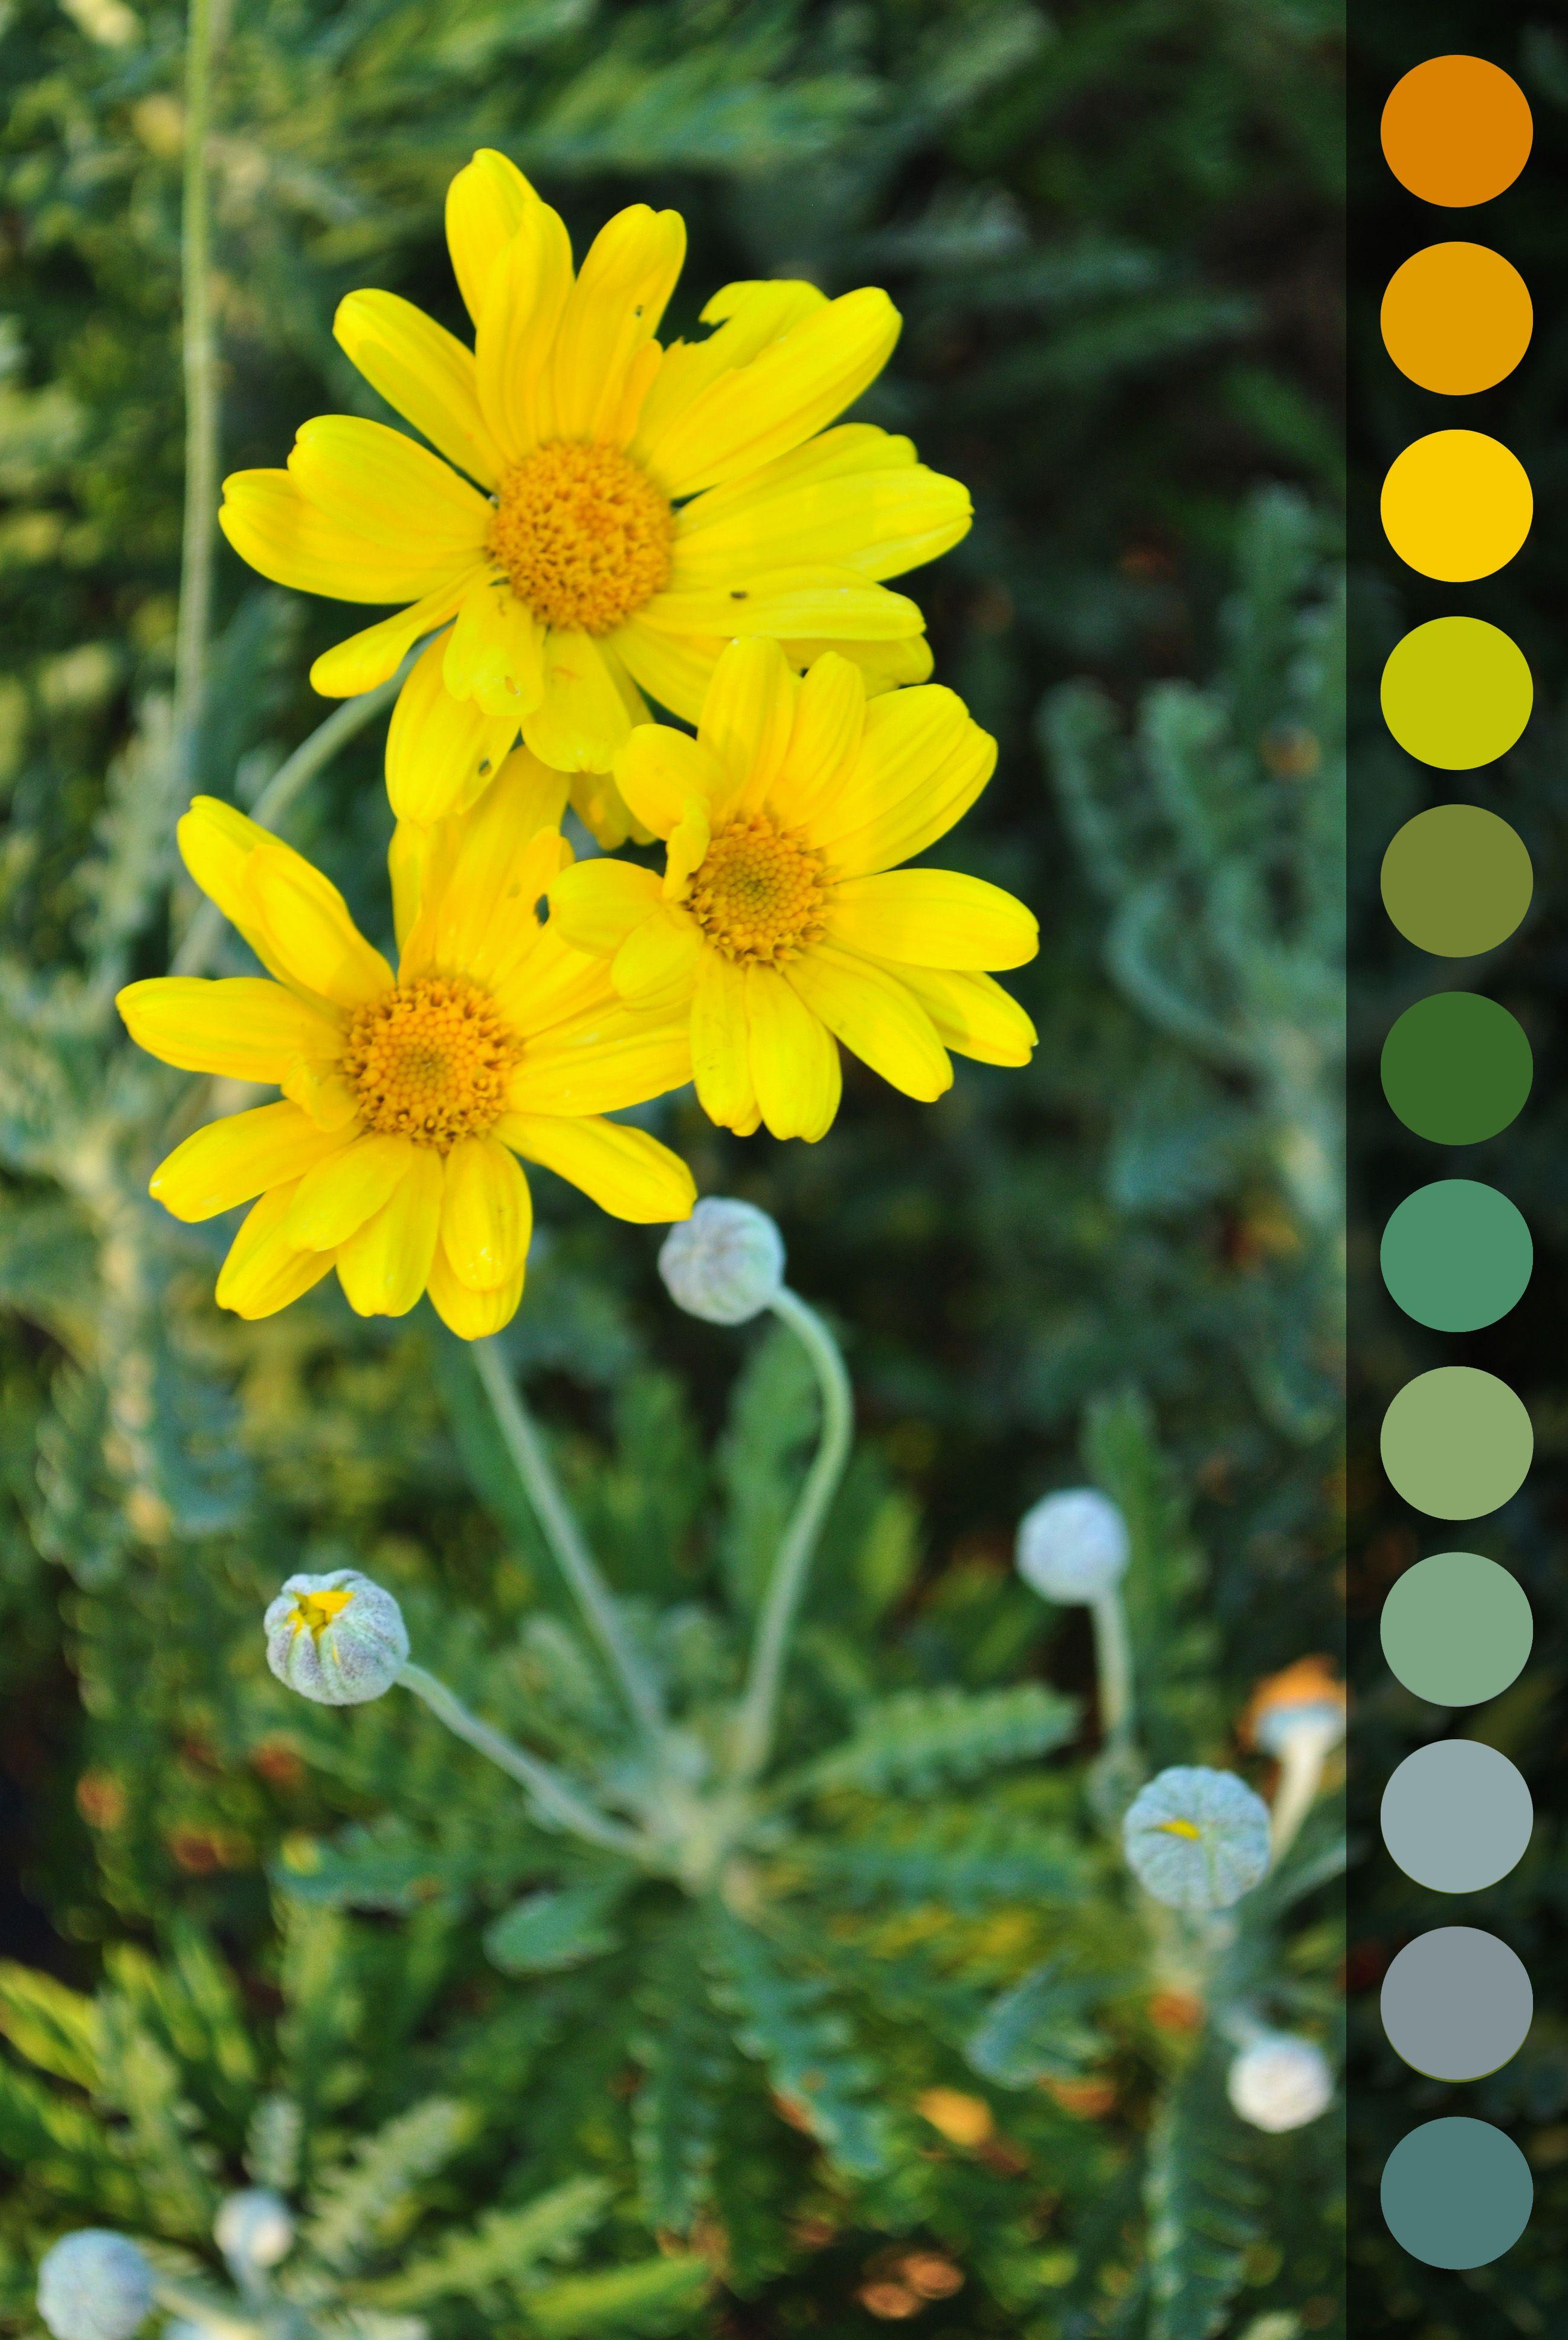 Euryops Pectinatus   Arbusto Sempreverde Con Piccole Foglie  Verde Argentate, La Sua Fioritura Avviene